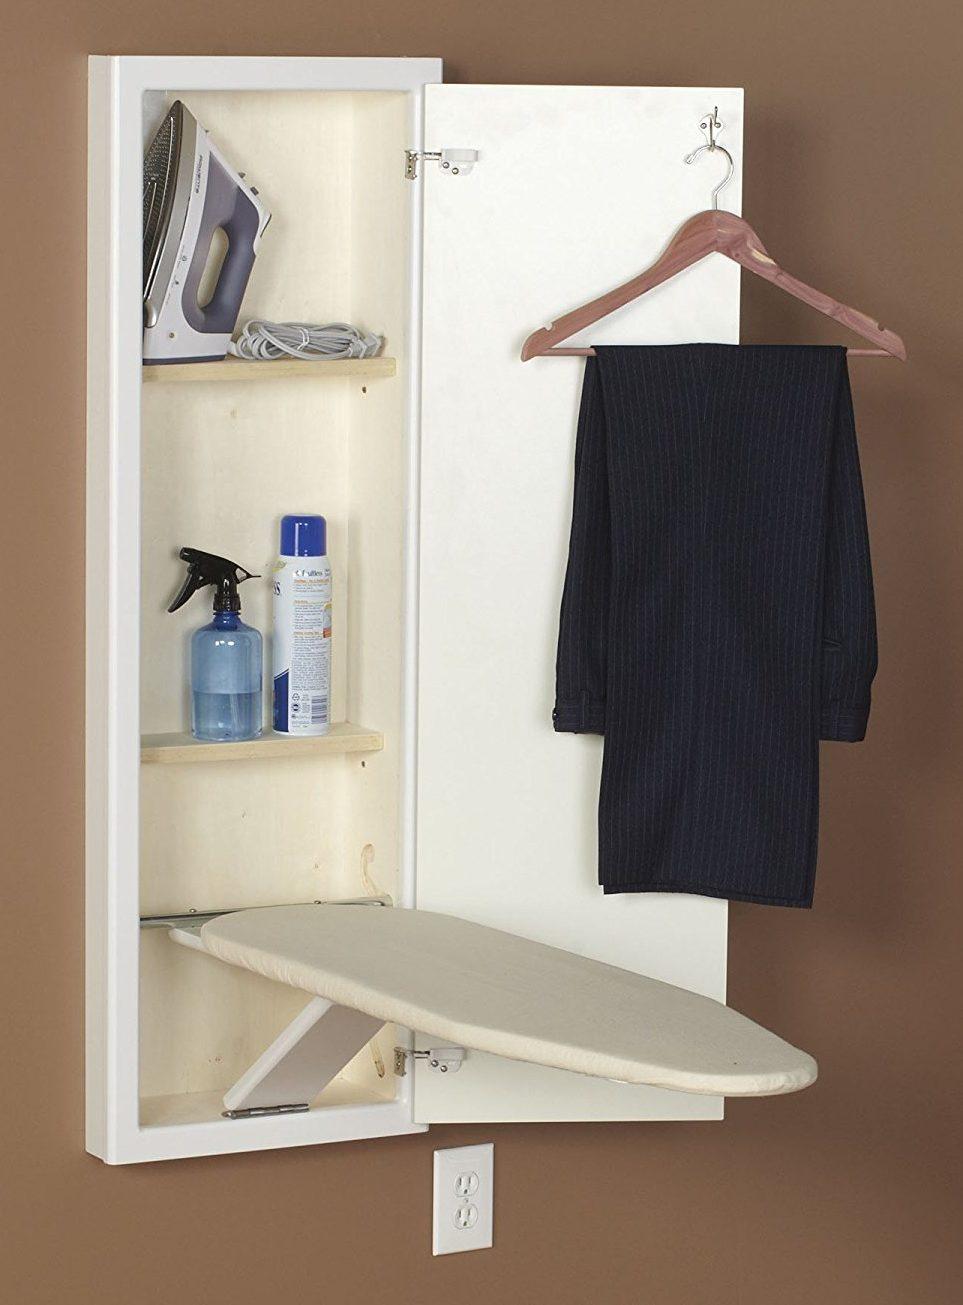 Household Essentials StowAway Ironing Board